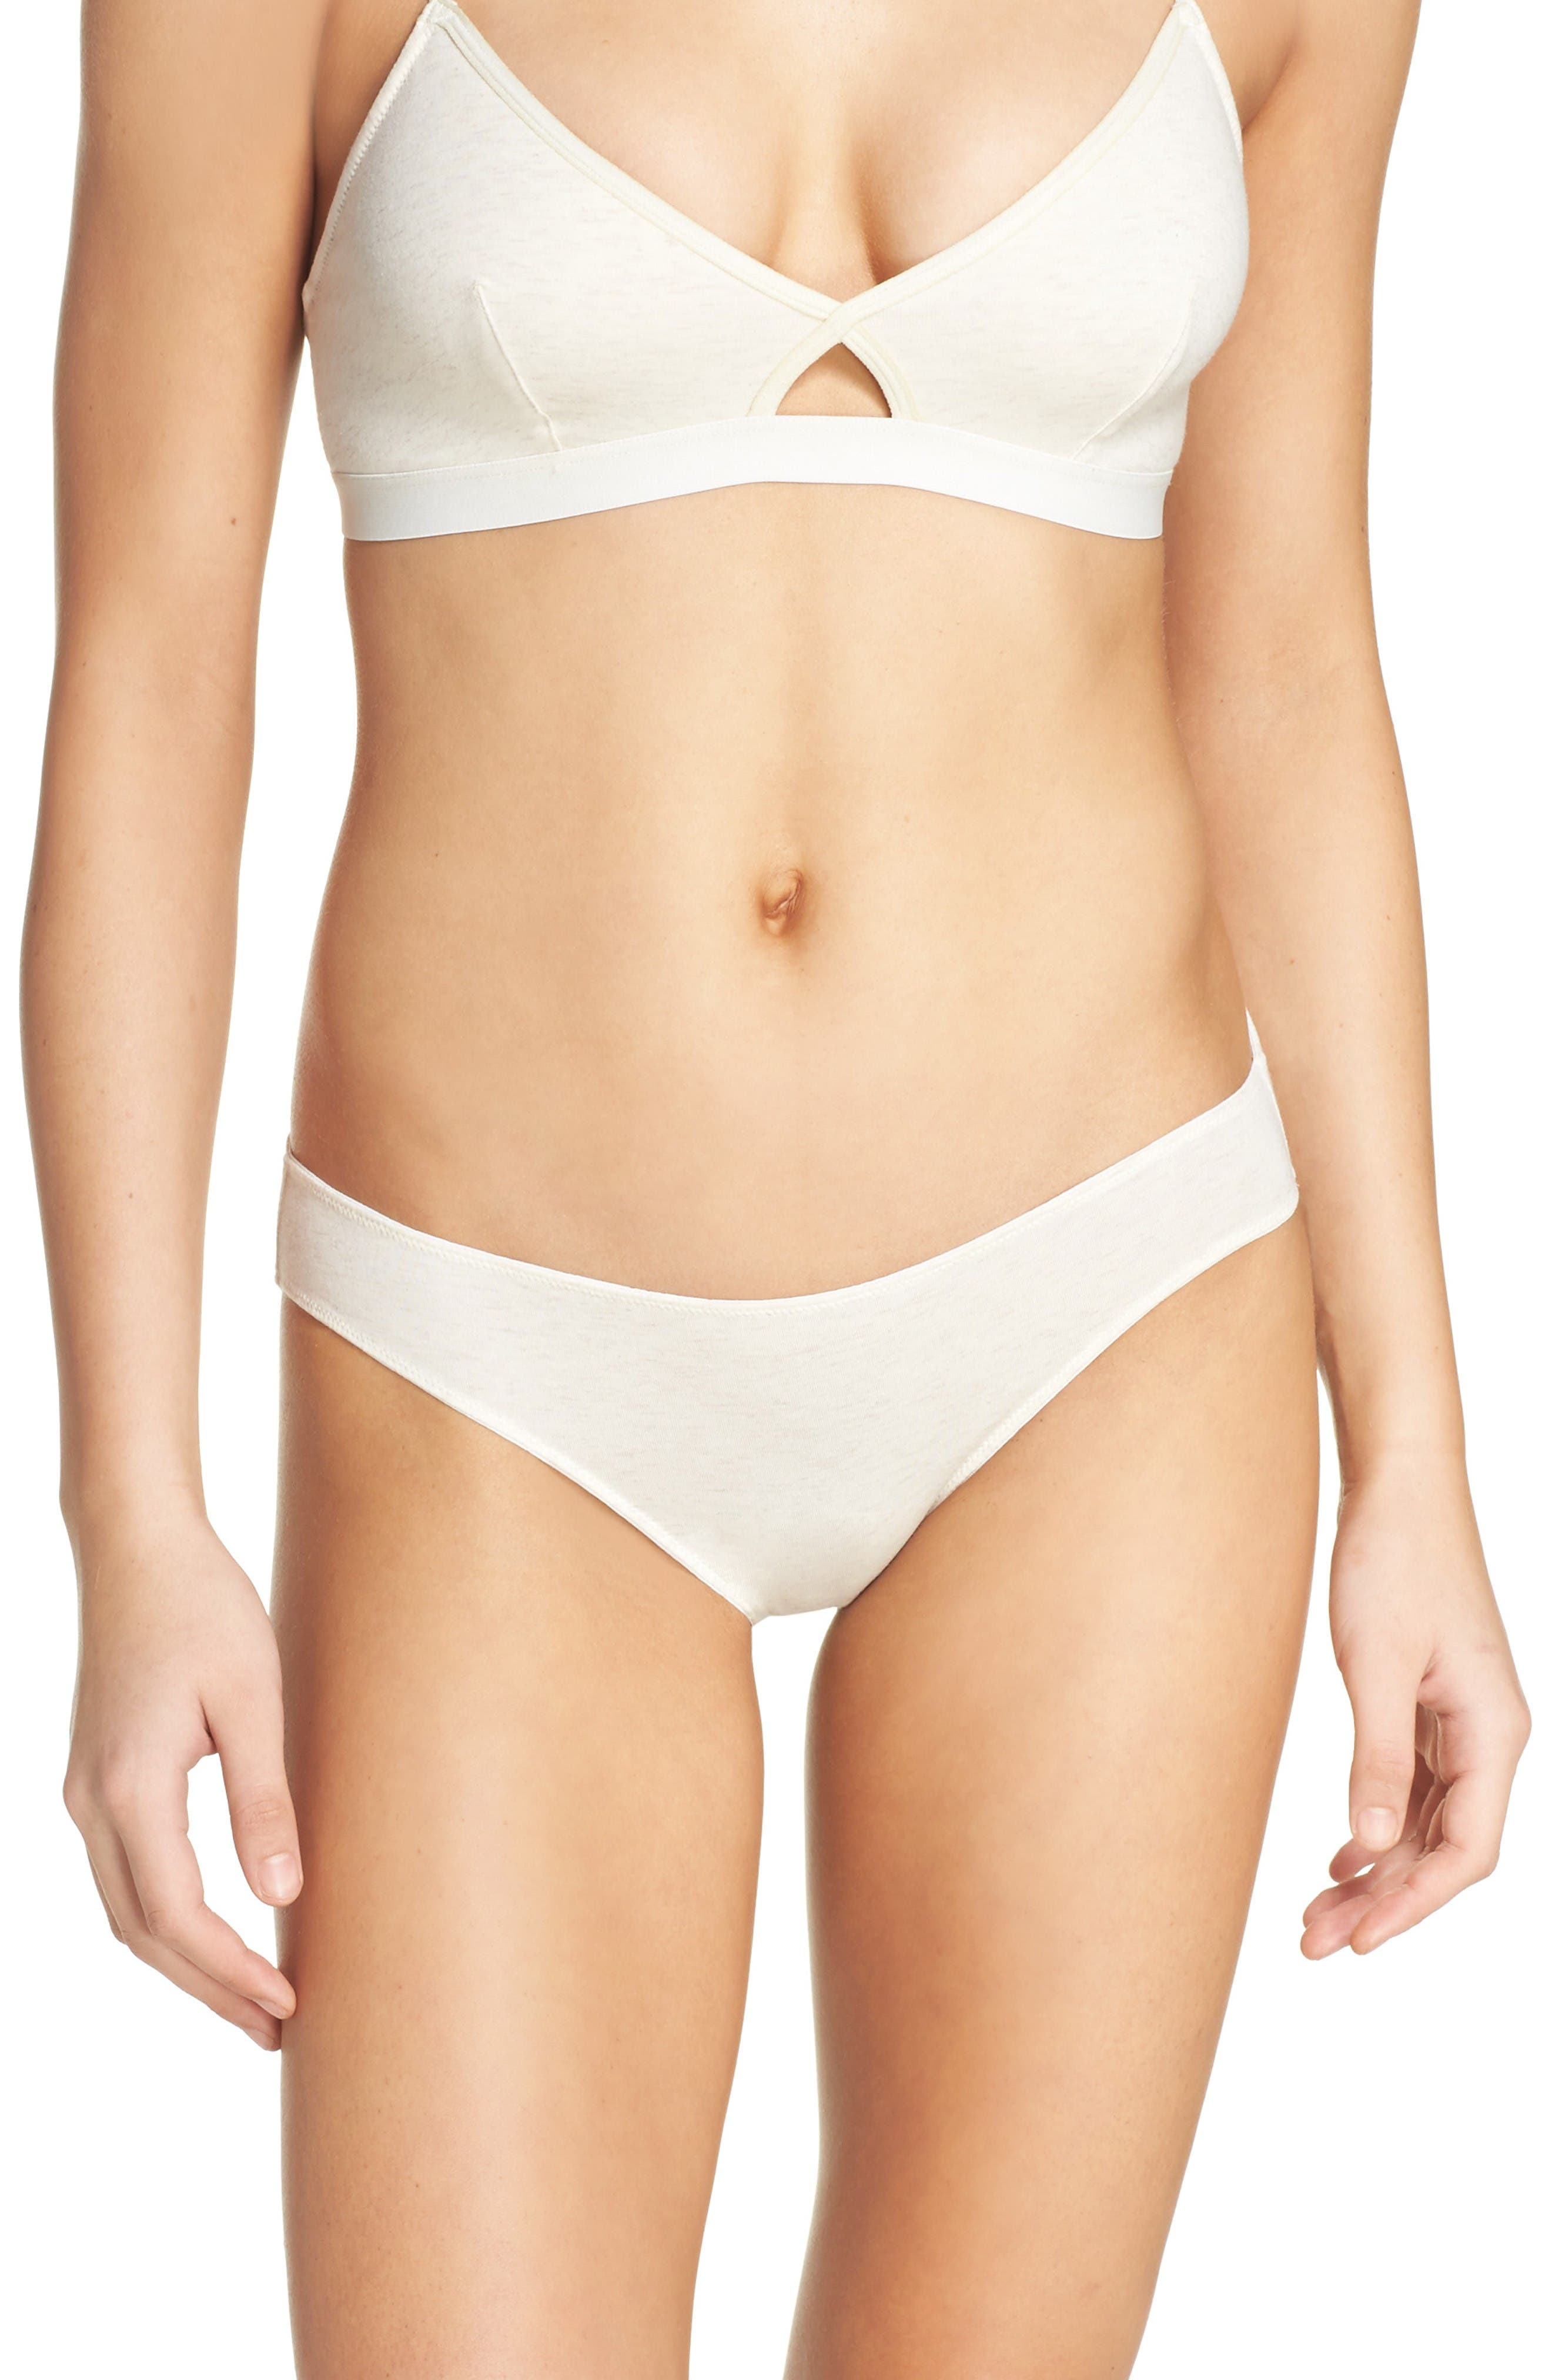 Madewell Jersey Bikini (3 for $ 33)